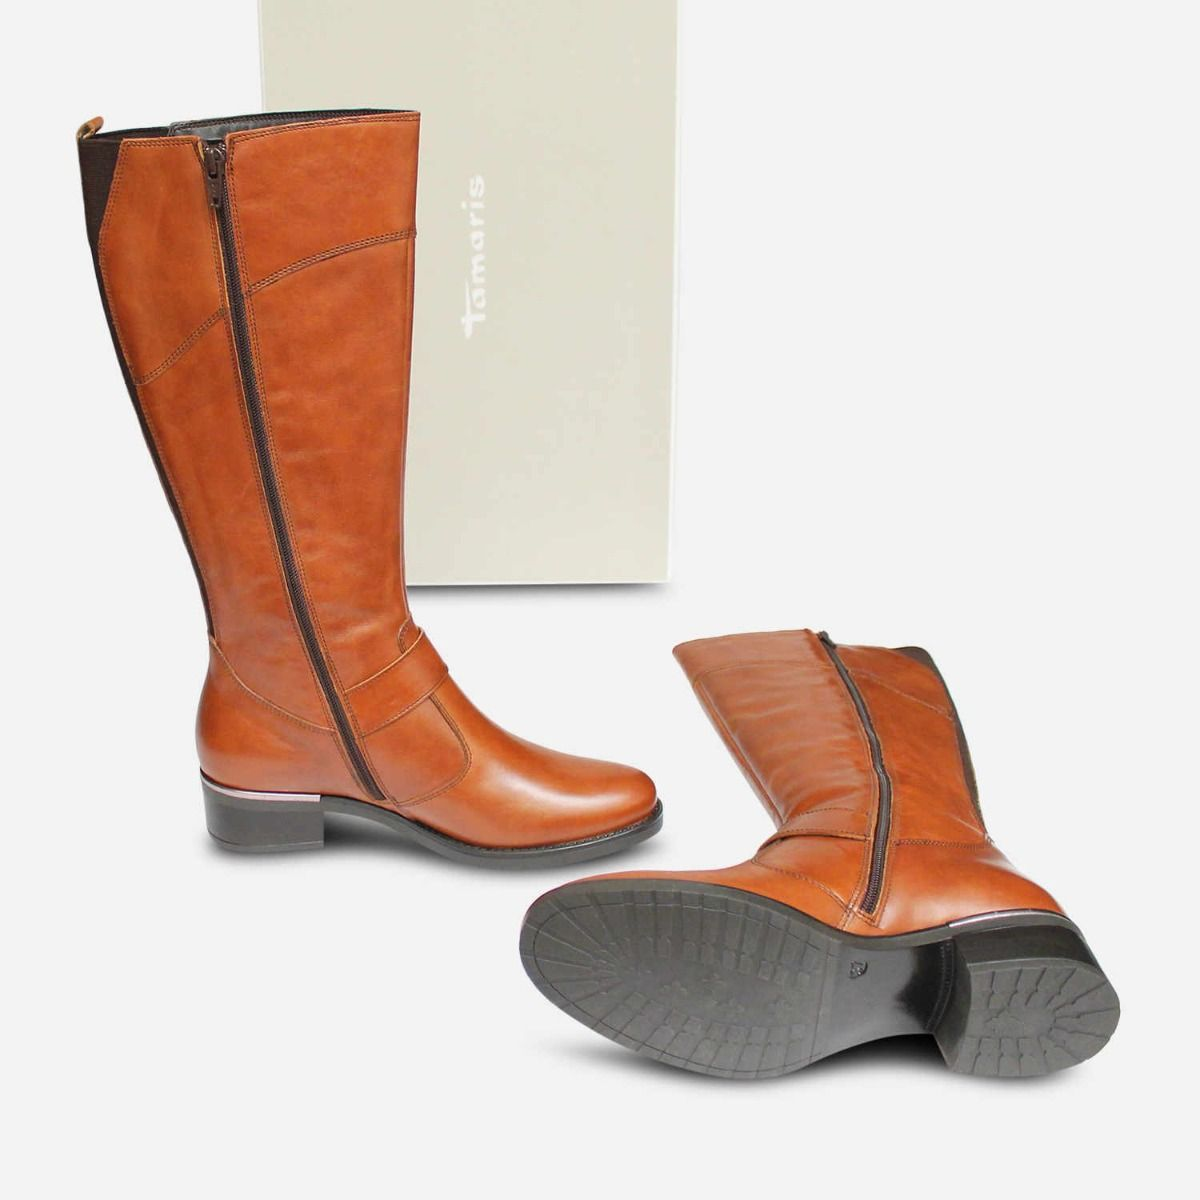 Boots Knee High Zip Antique Brown In Tamaris Leather UqzLMpjVGS